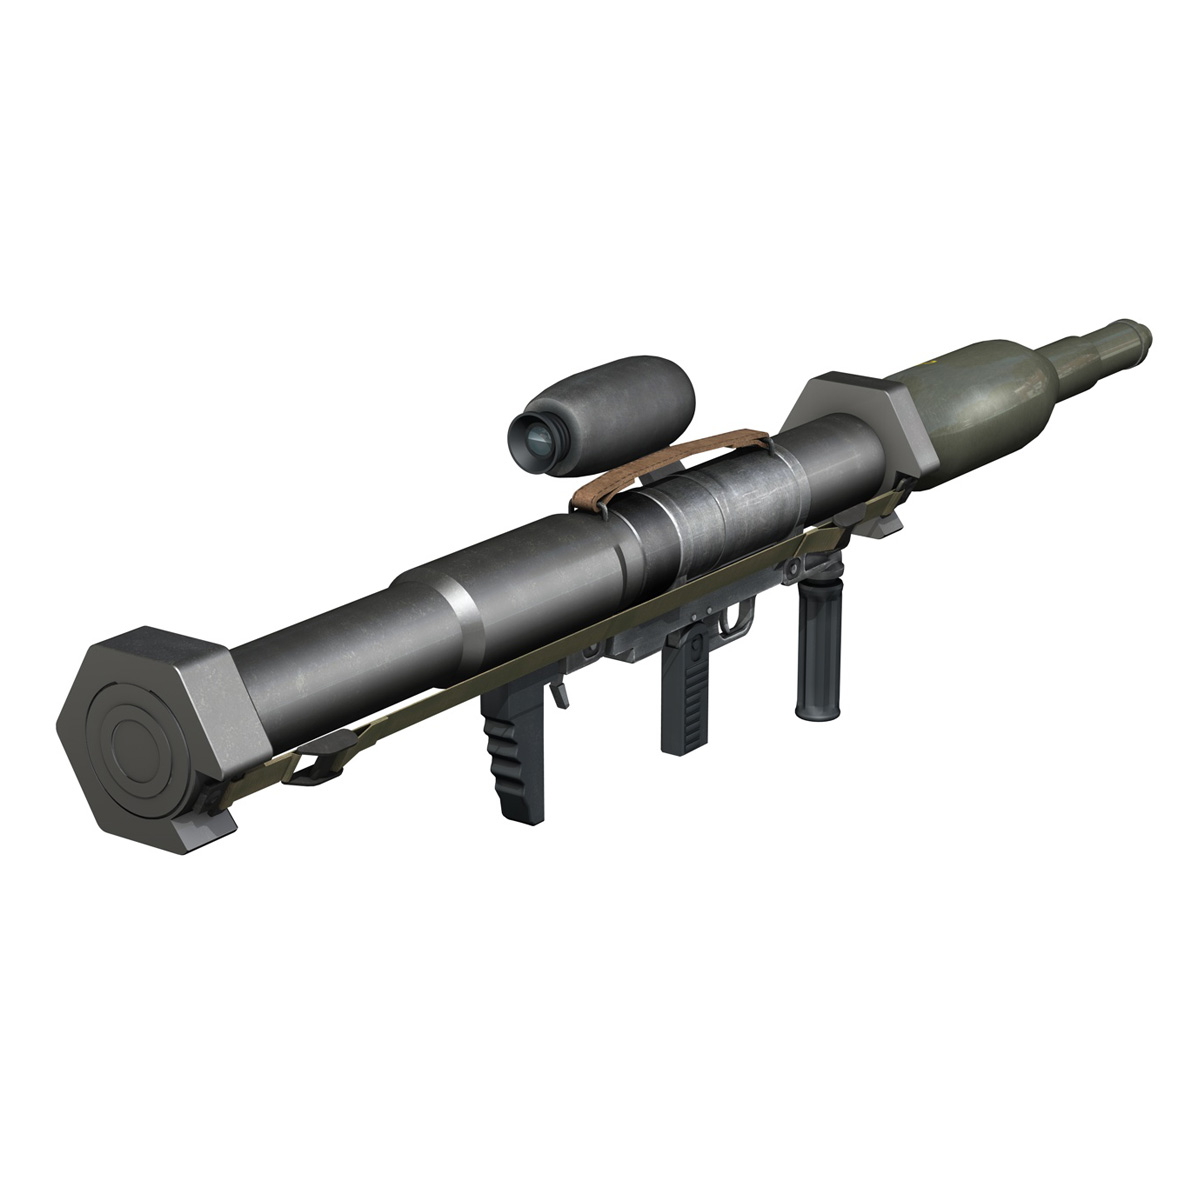 эсрэг танк пуужин launcher panzerfaust 3 3d загвар 3ds c4d lwo obj 263700